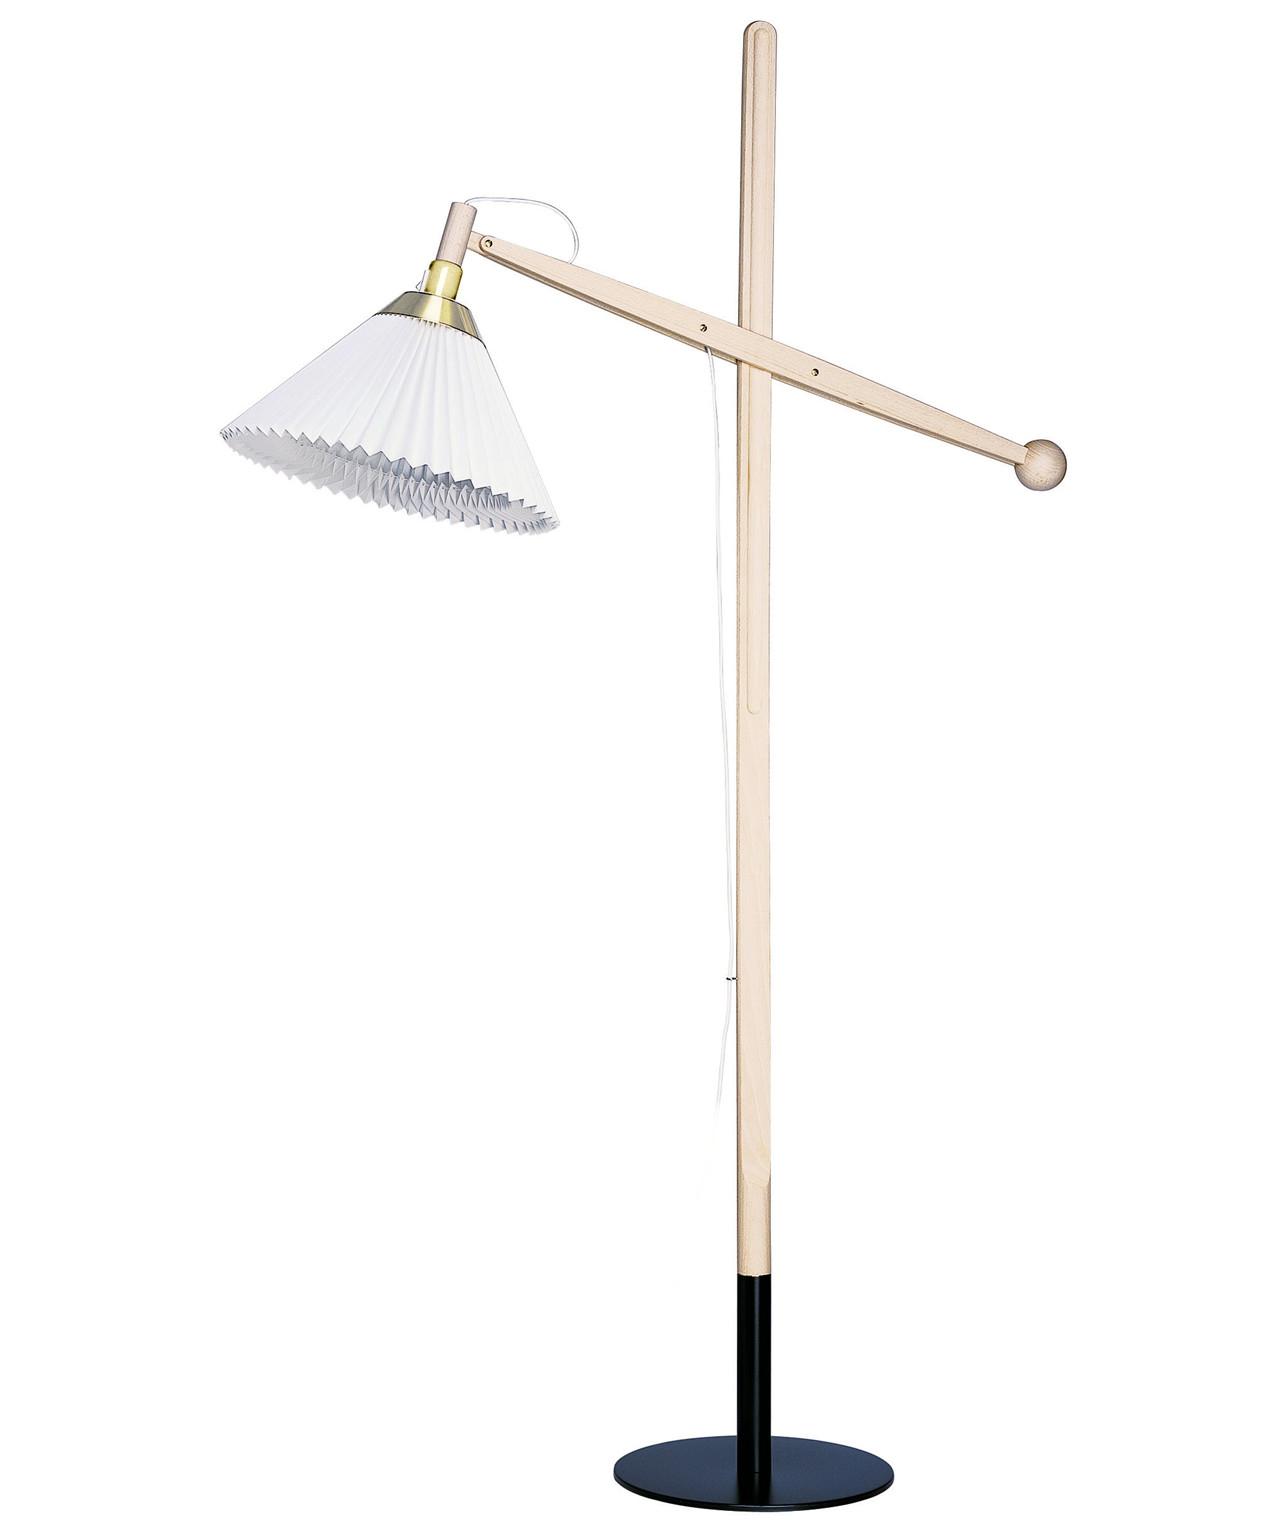 Le klint 325 gulvlampe eg - le klint fra N/A fra lampemesteren.dk